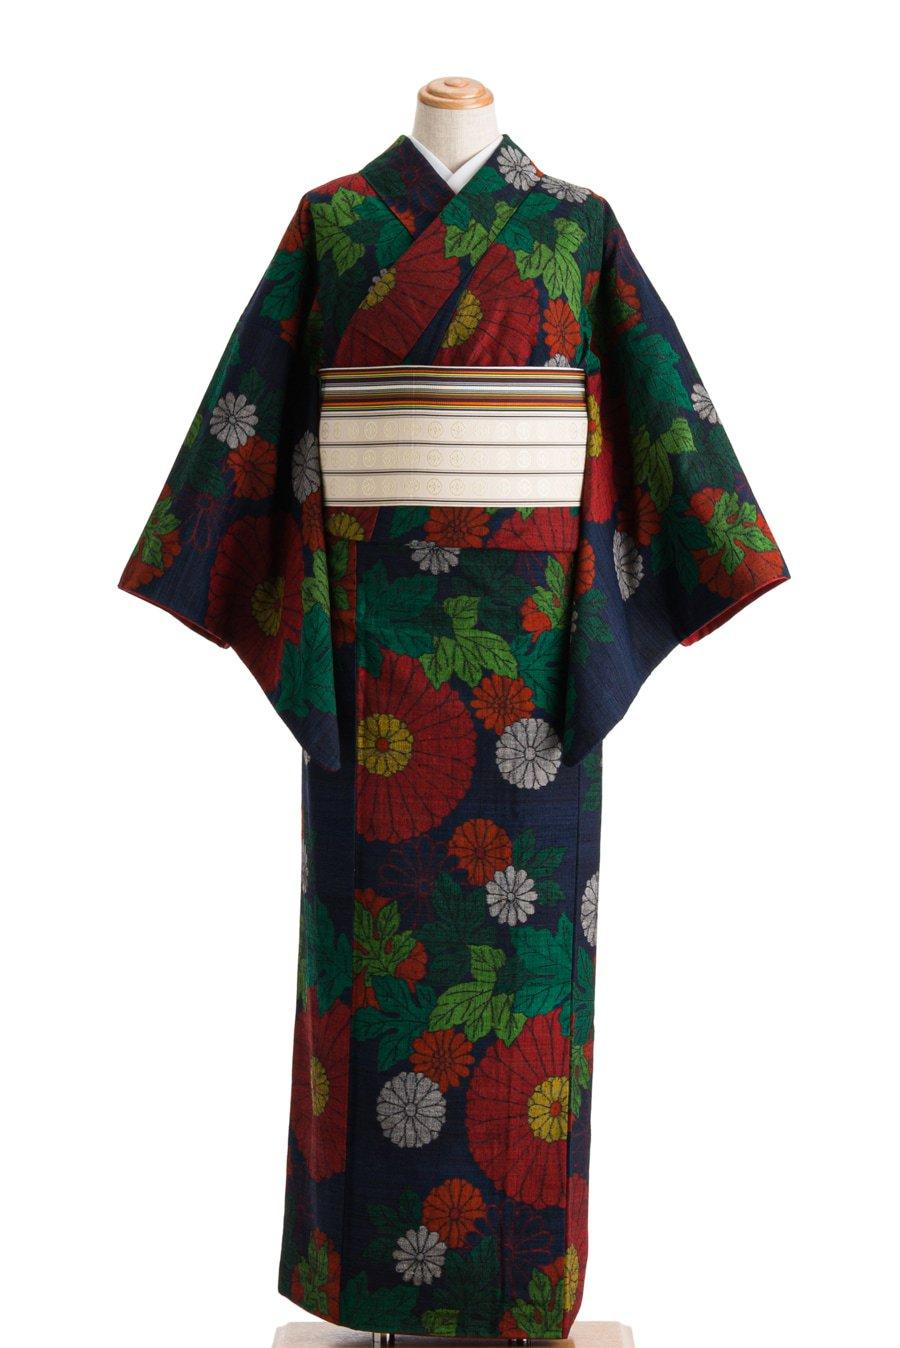 「紬 大小紅白菊」の商品画像